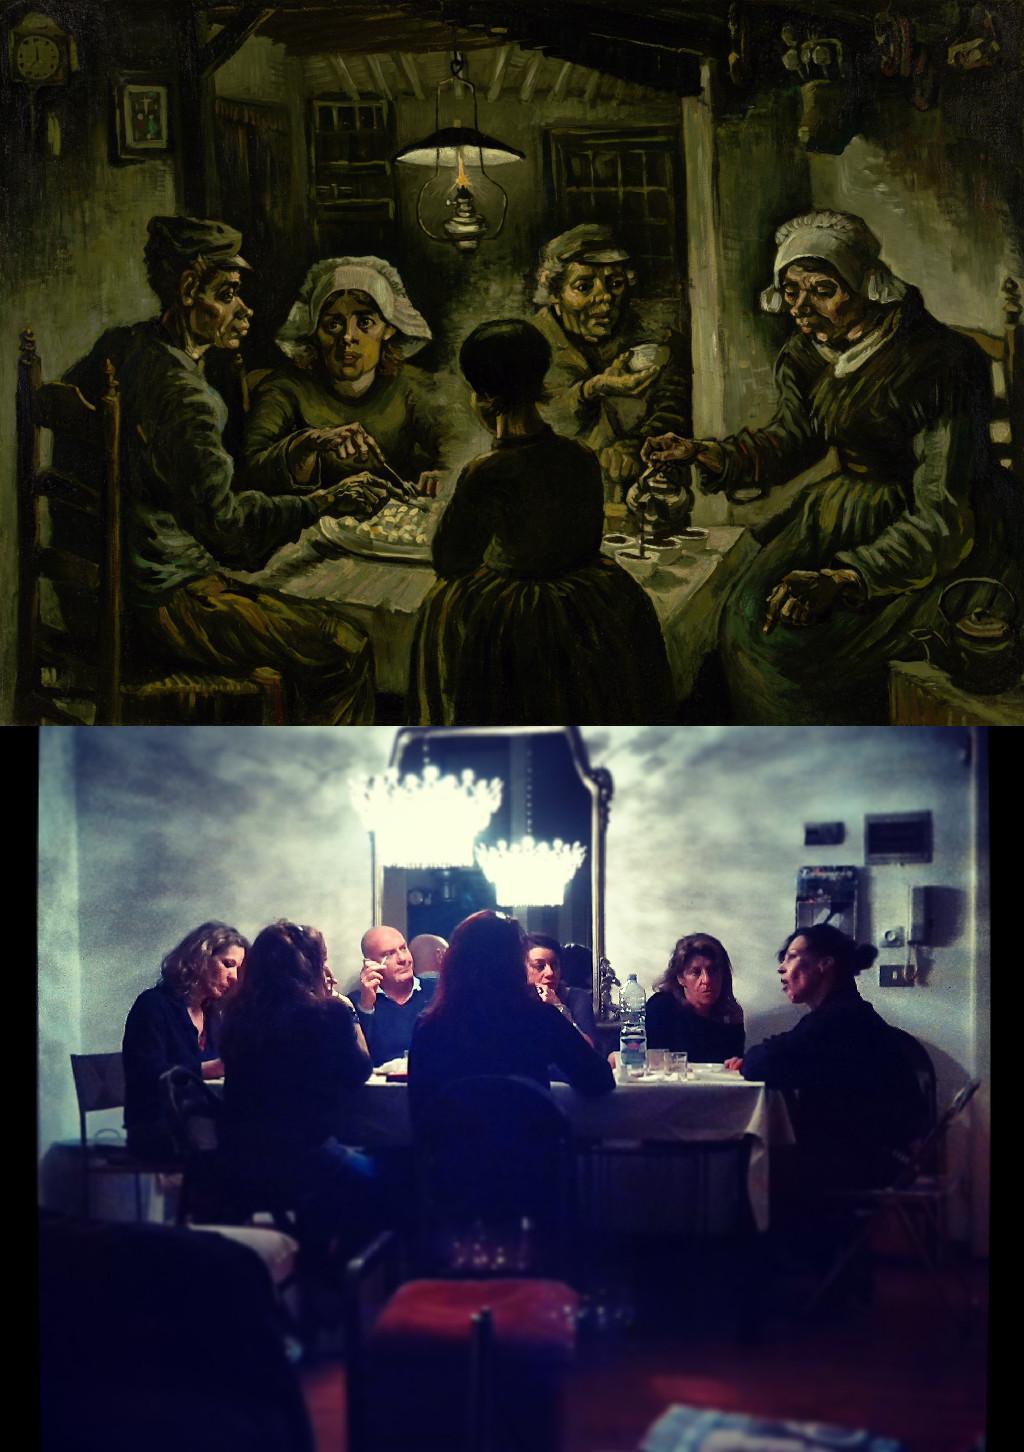 The Potato Eaters, Vincent van Gogh (1853-1890) vanGo'd by Federico Forconi